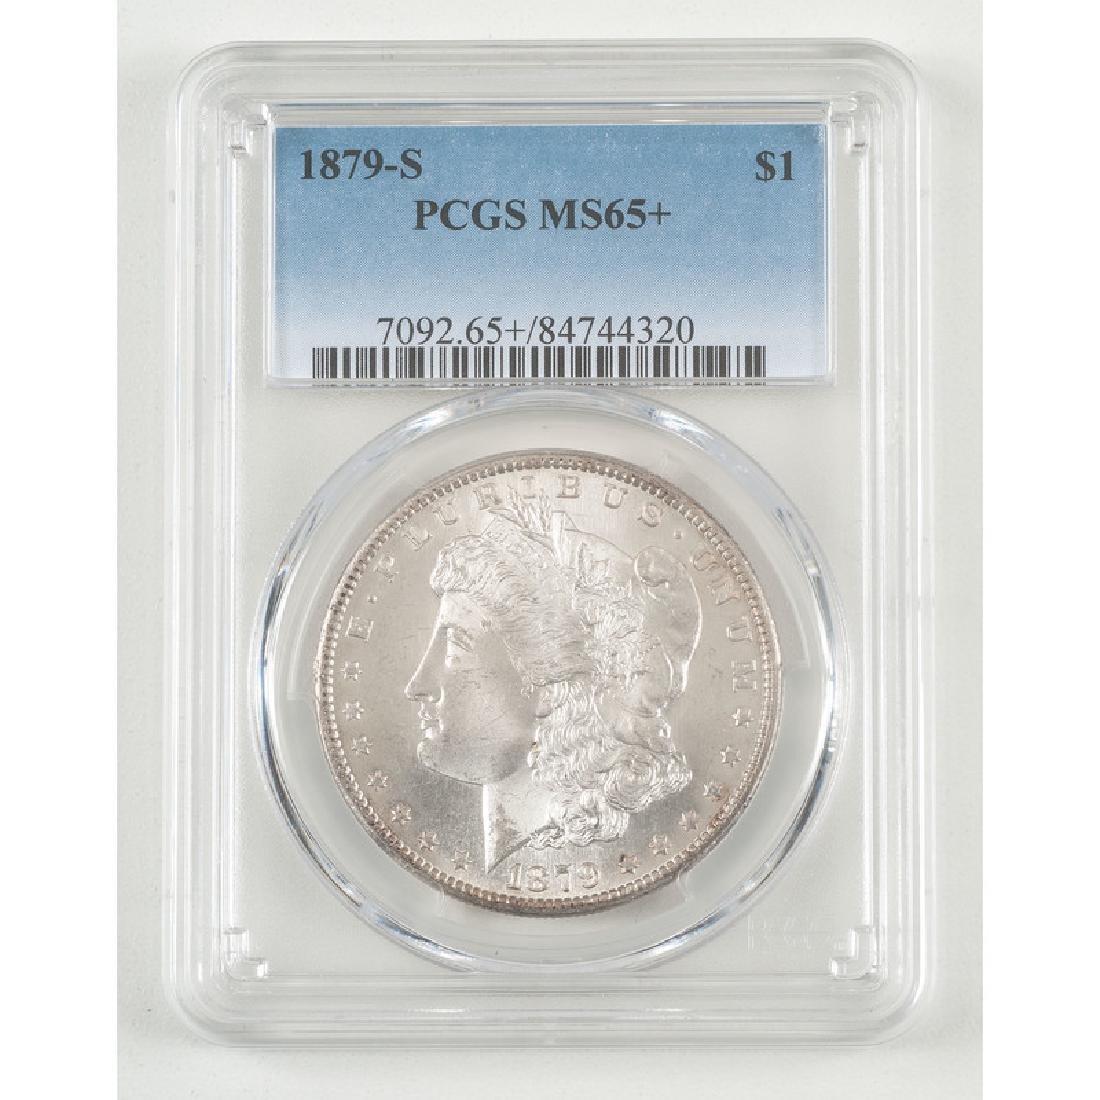 United States Morgan Silver Dollar 1879-S, PCGS MS65+